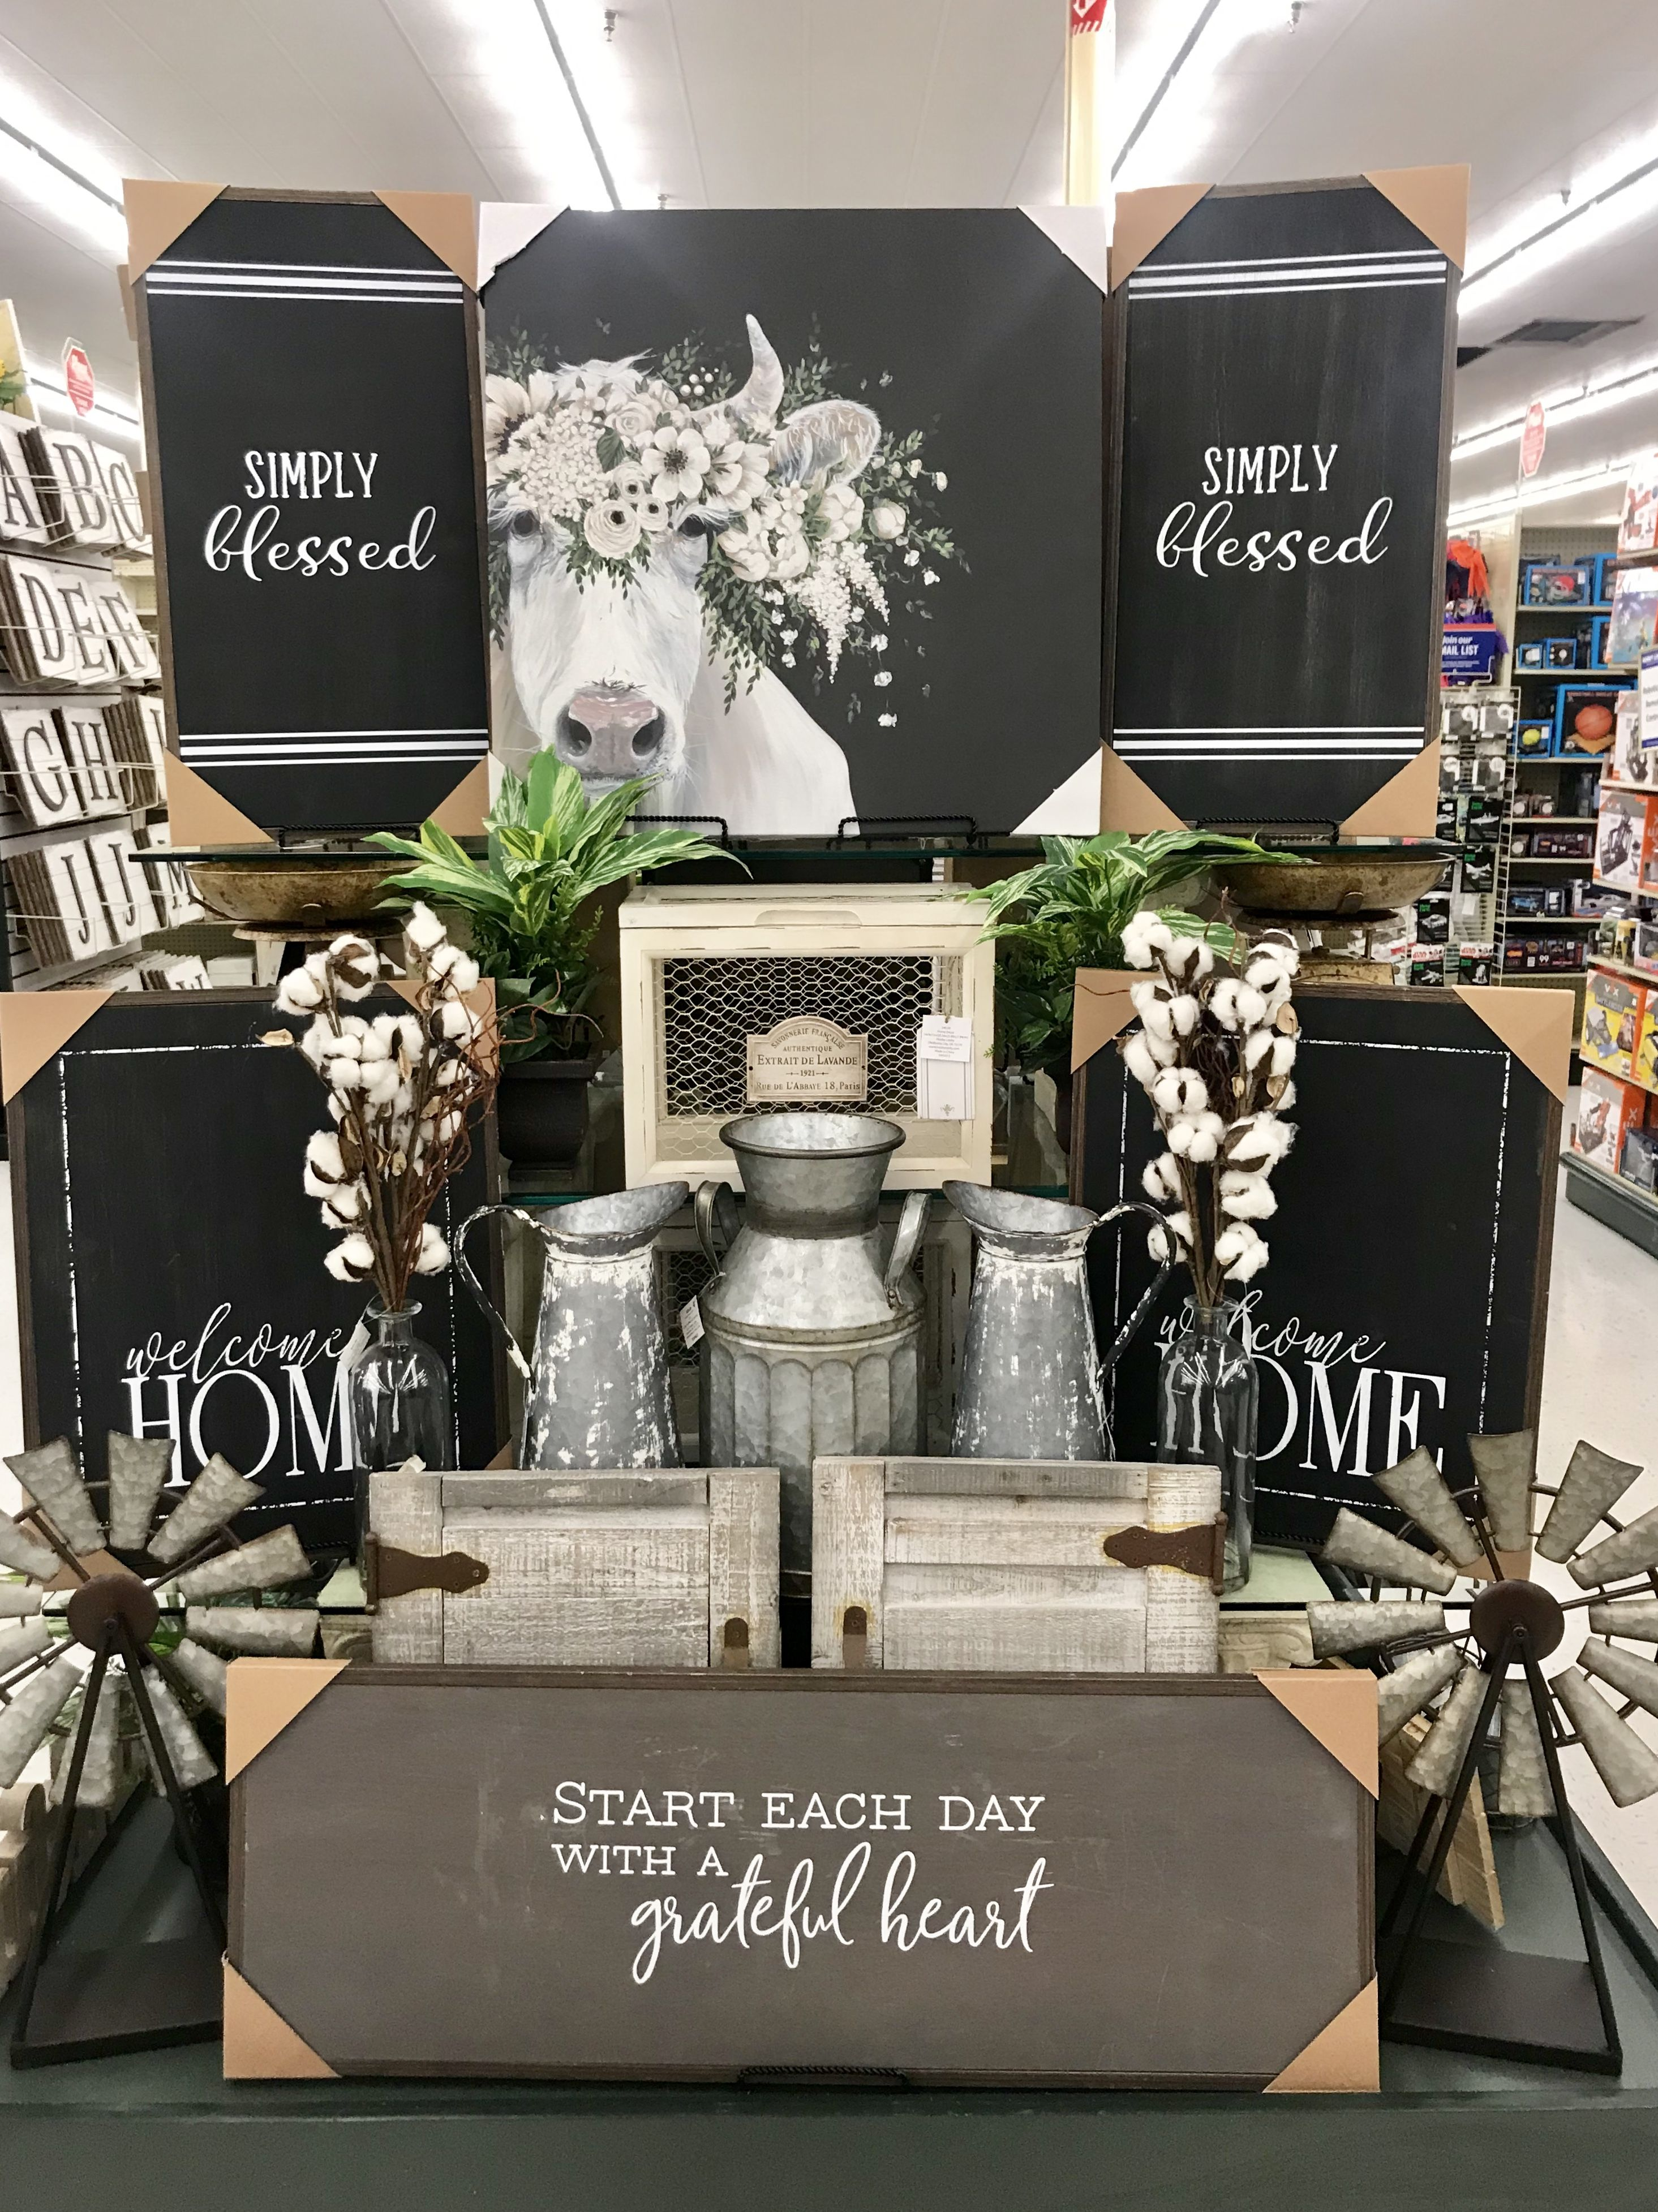 Hobby lobby merchandising table displays work/Kv Hobby